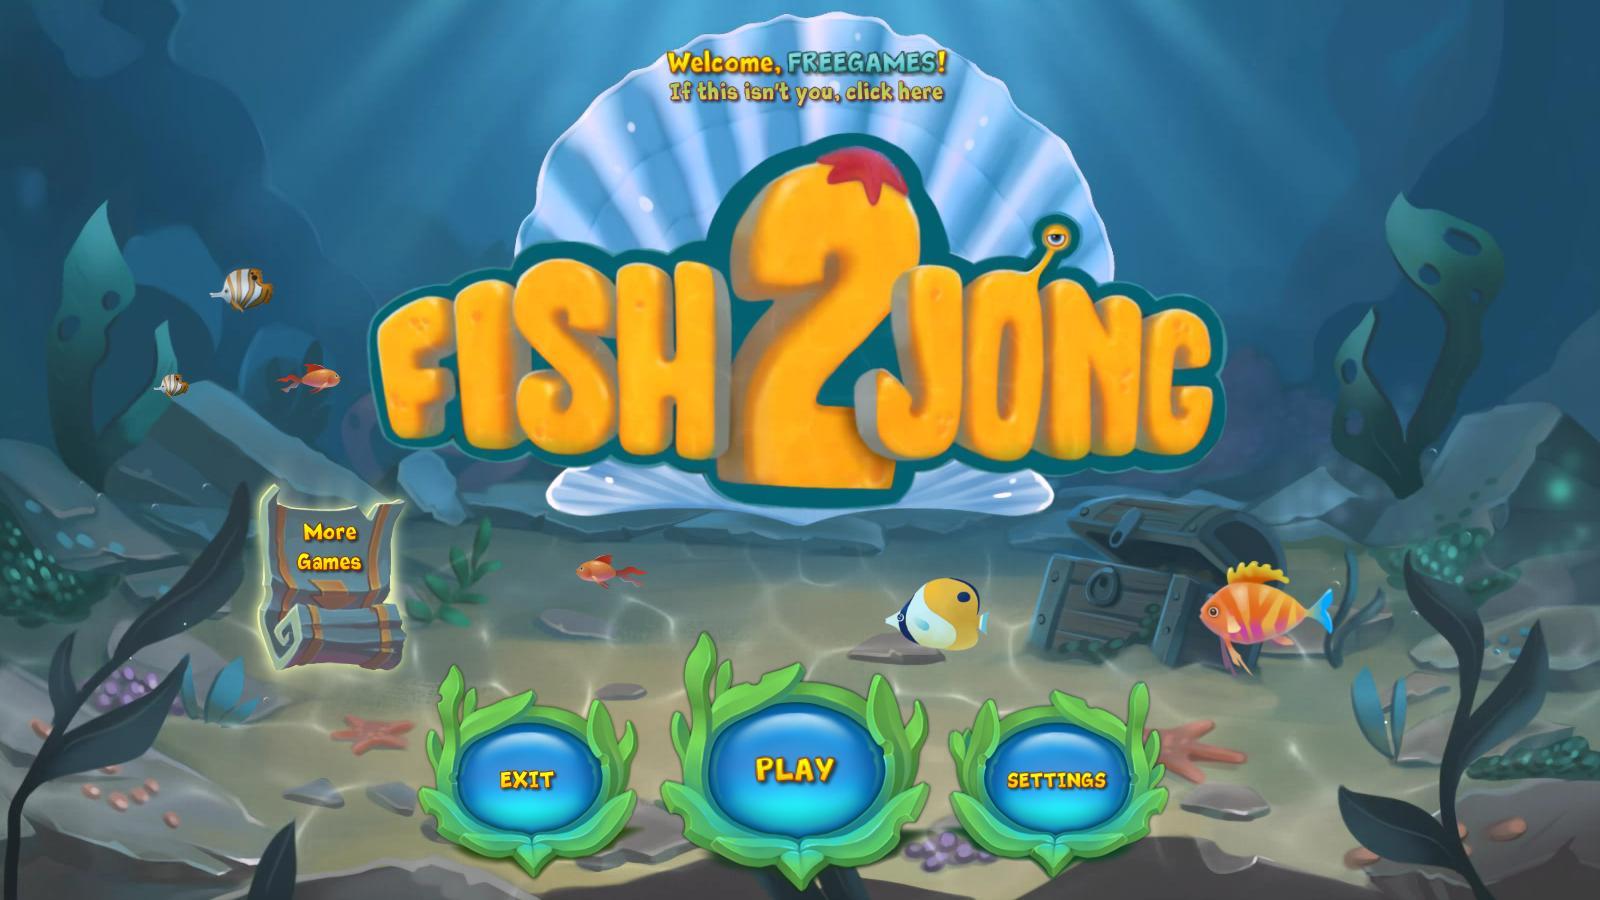 Фишджонг 2 | Fishjong 2 (En)